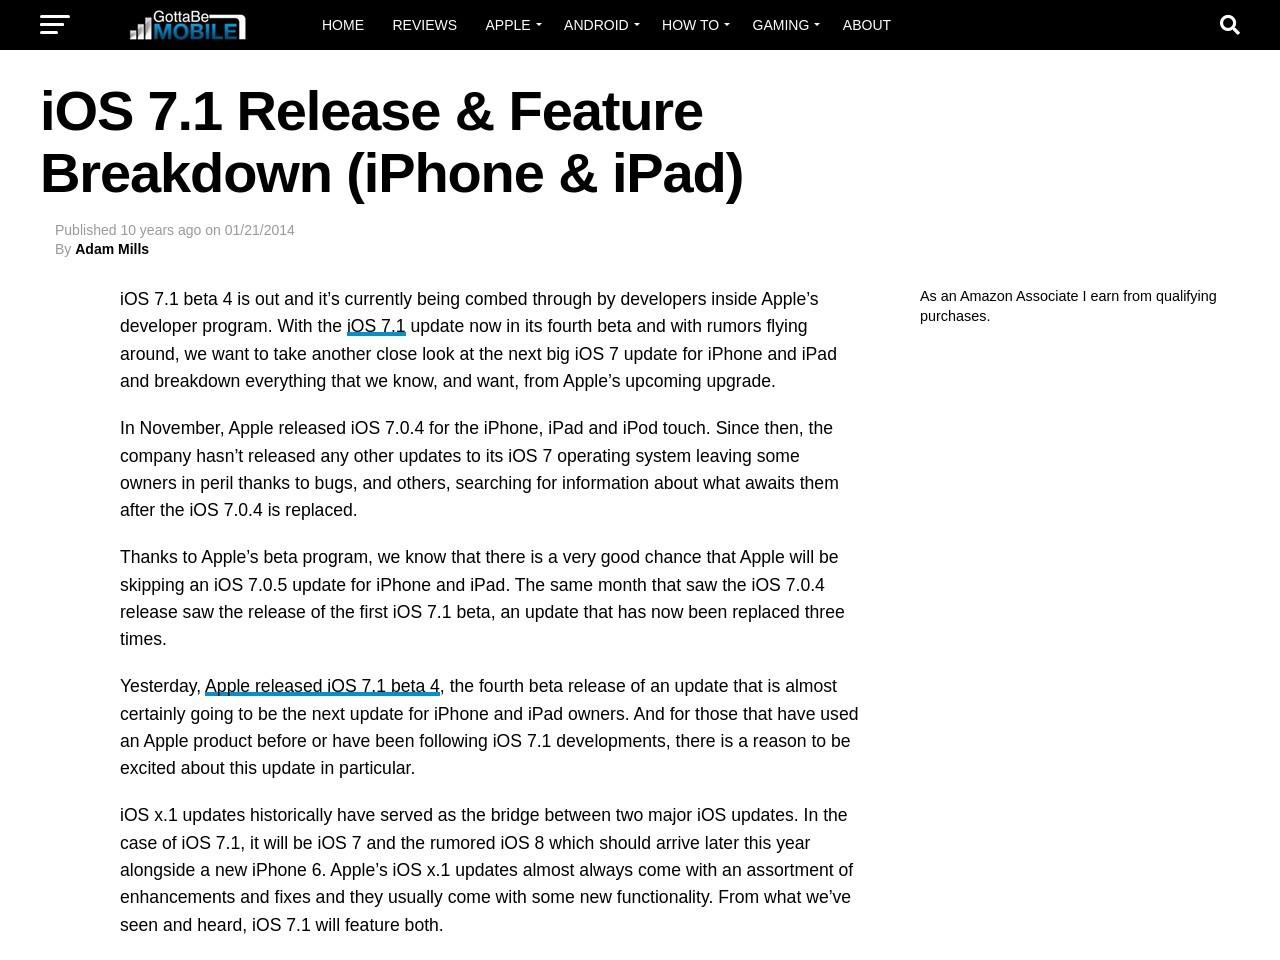 iOS 7.1 Release & Feature Breakdown (iPhone & iPad)